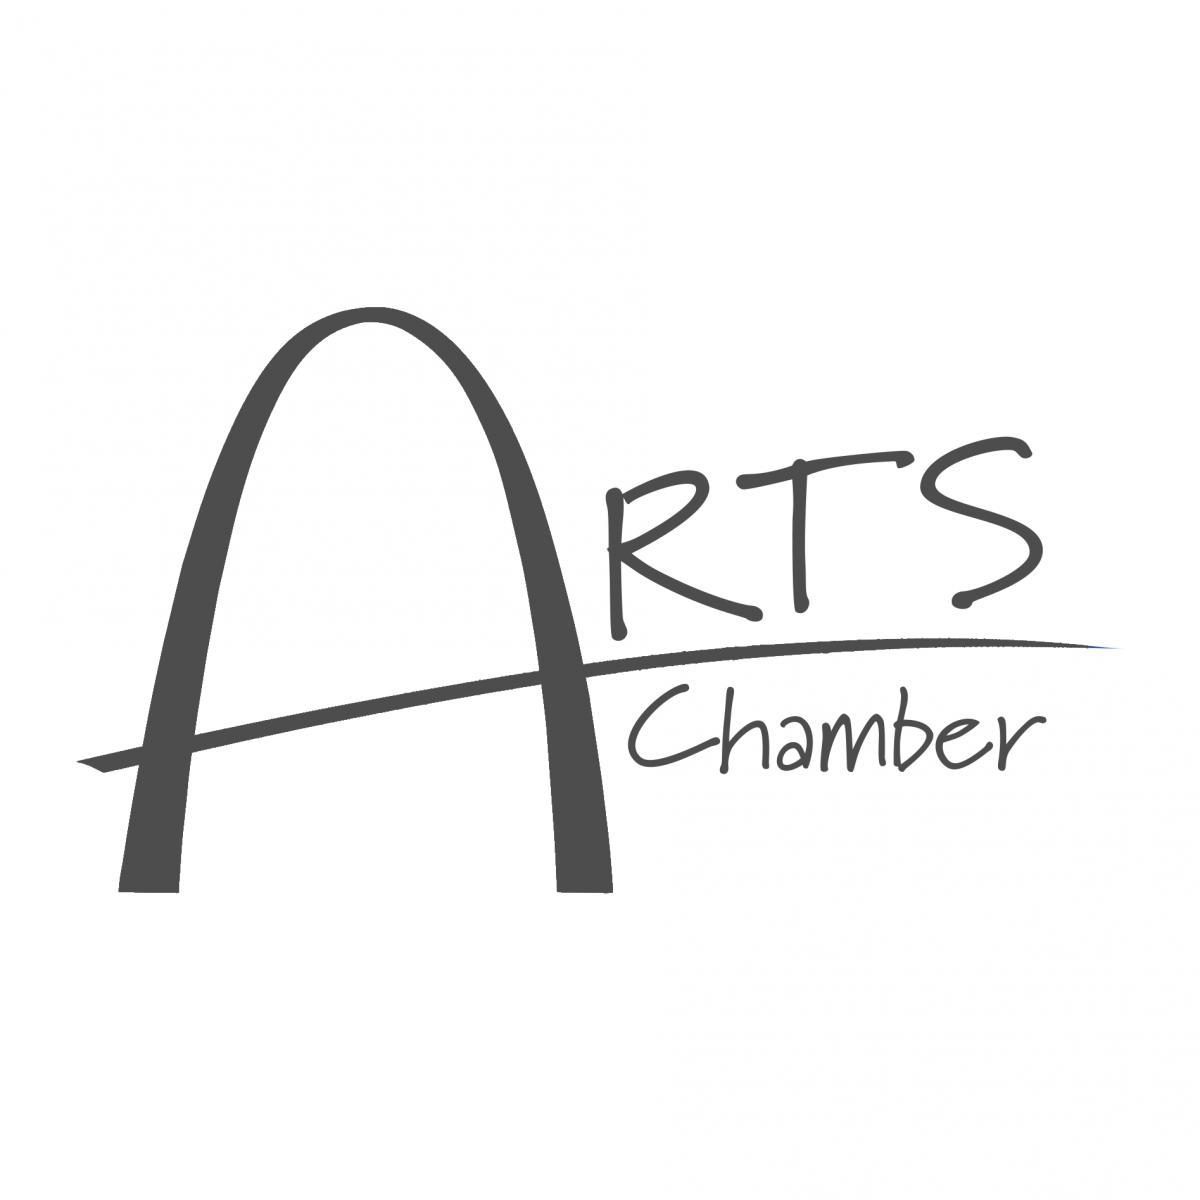 St. Louis Arts Chamber